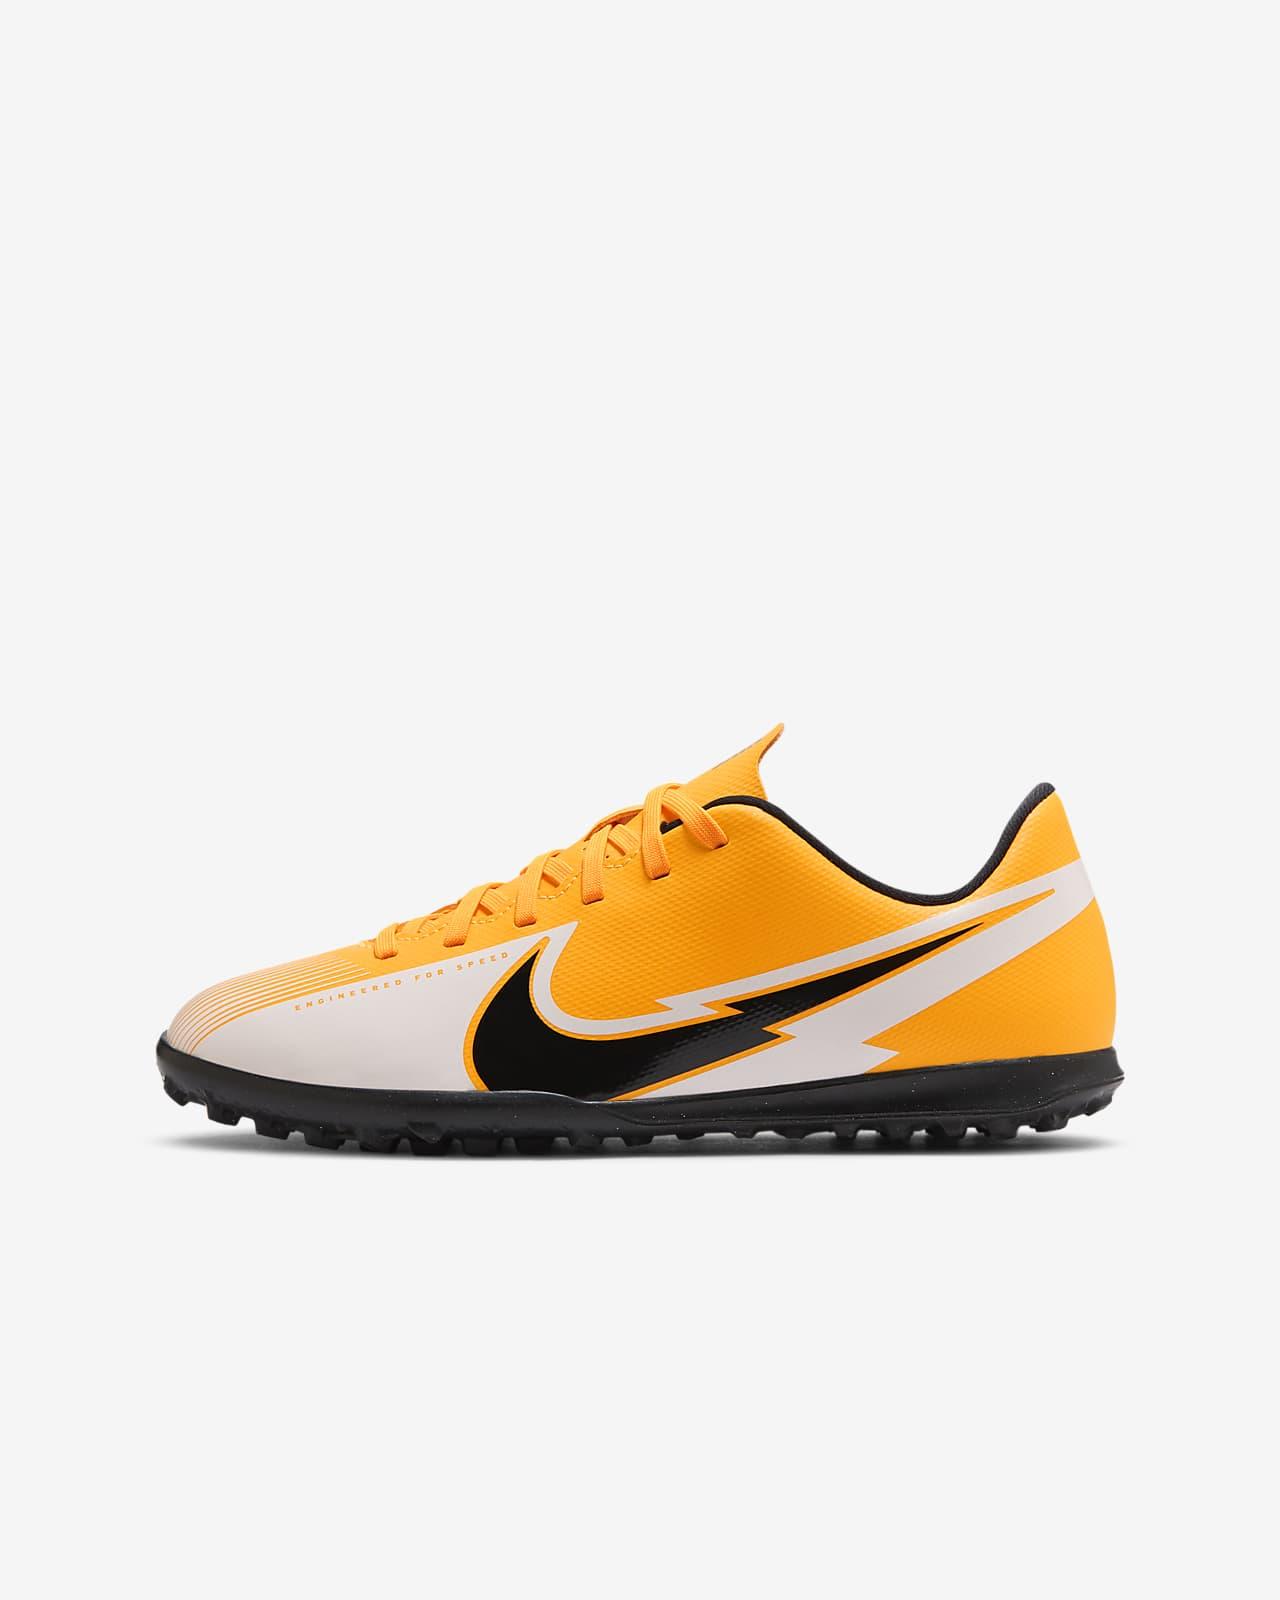 celebrar para letra  Nike Jr. Mercurial Vapor 13 Club TF Botas de fútbol para moqueta - Turf  artificial - Niño/a y niño/a pequeño/a. Nike ES